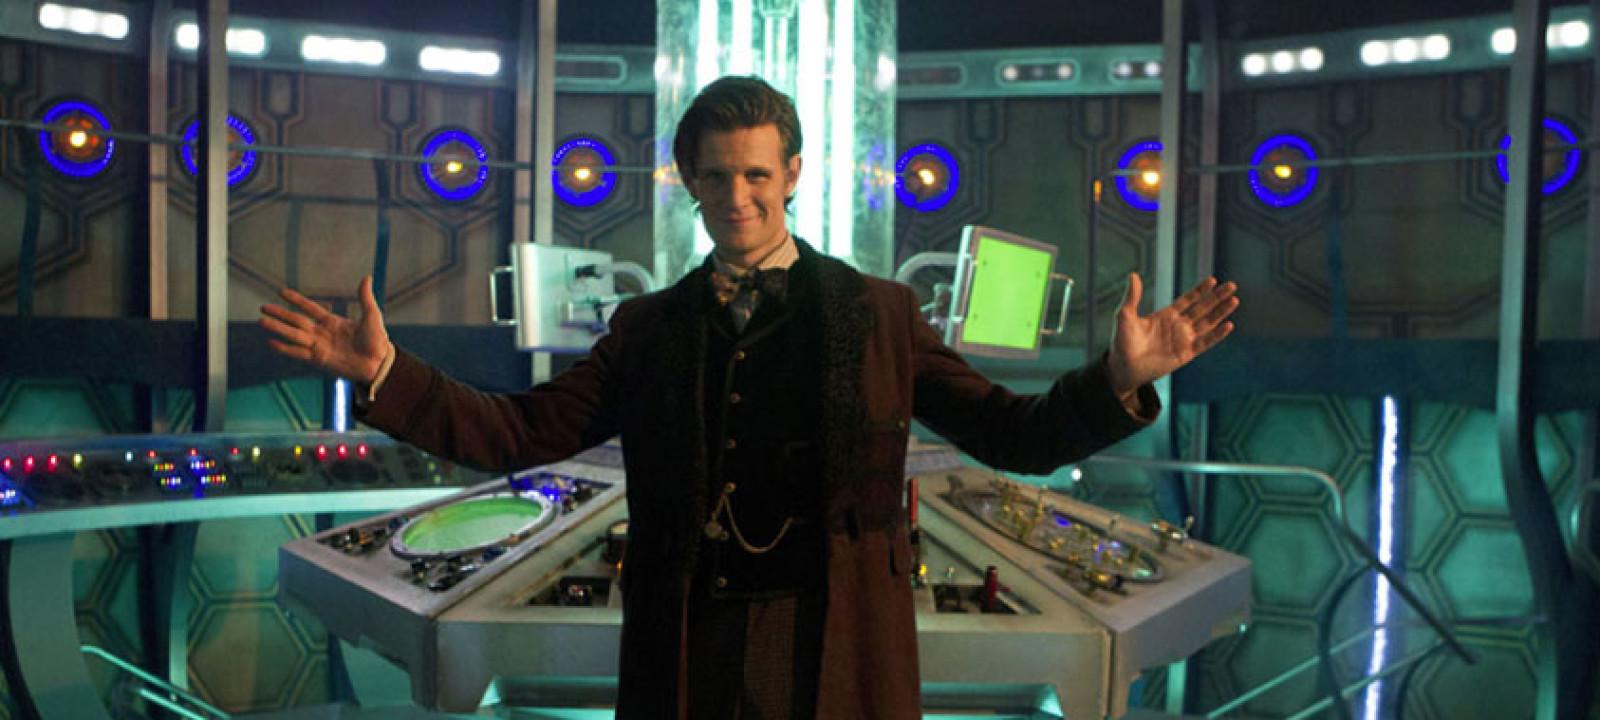 The new-look TARDIS interior